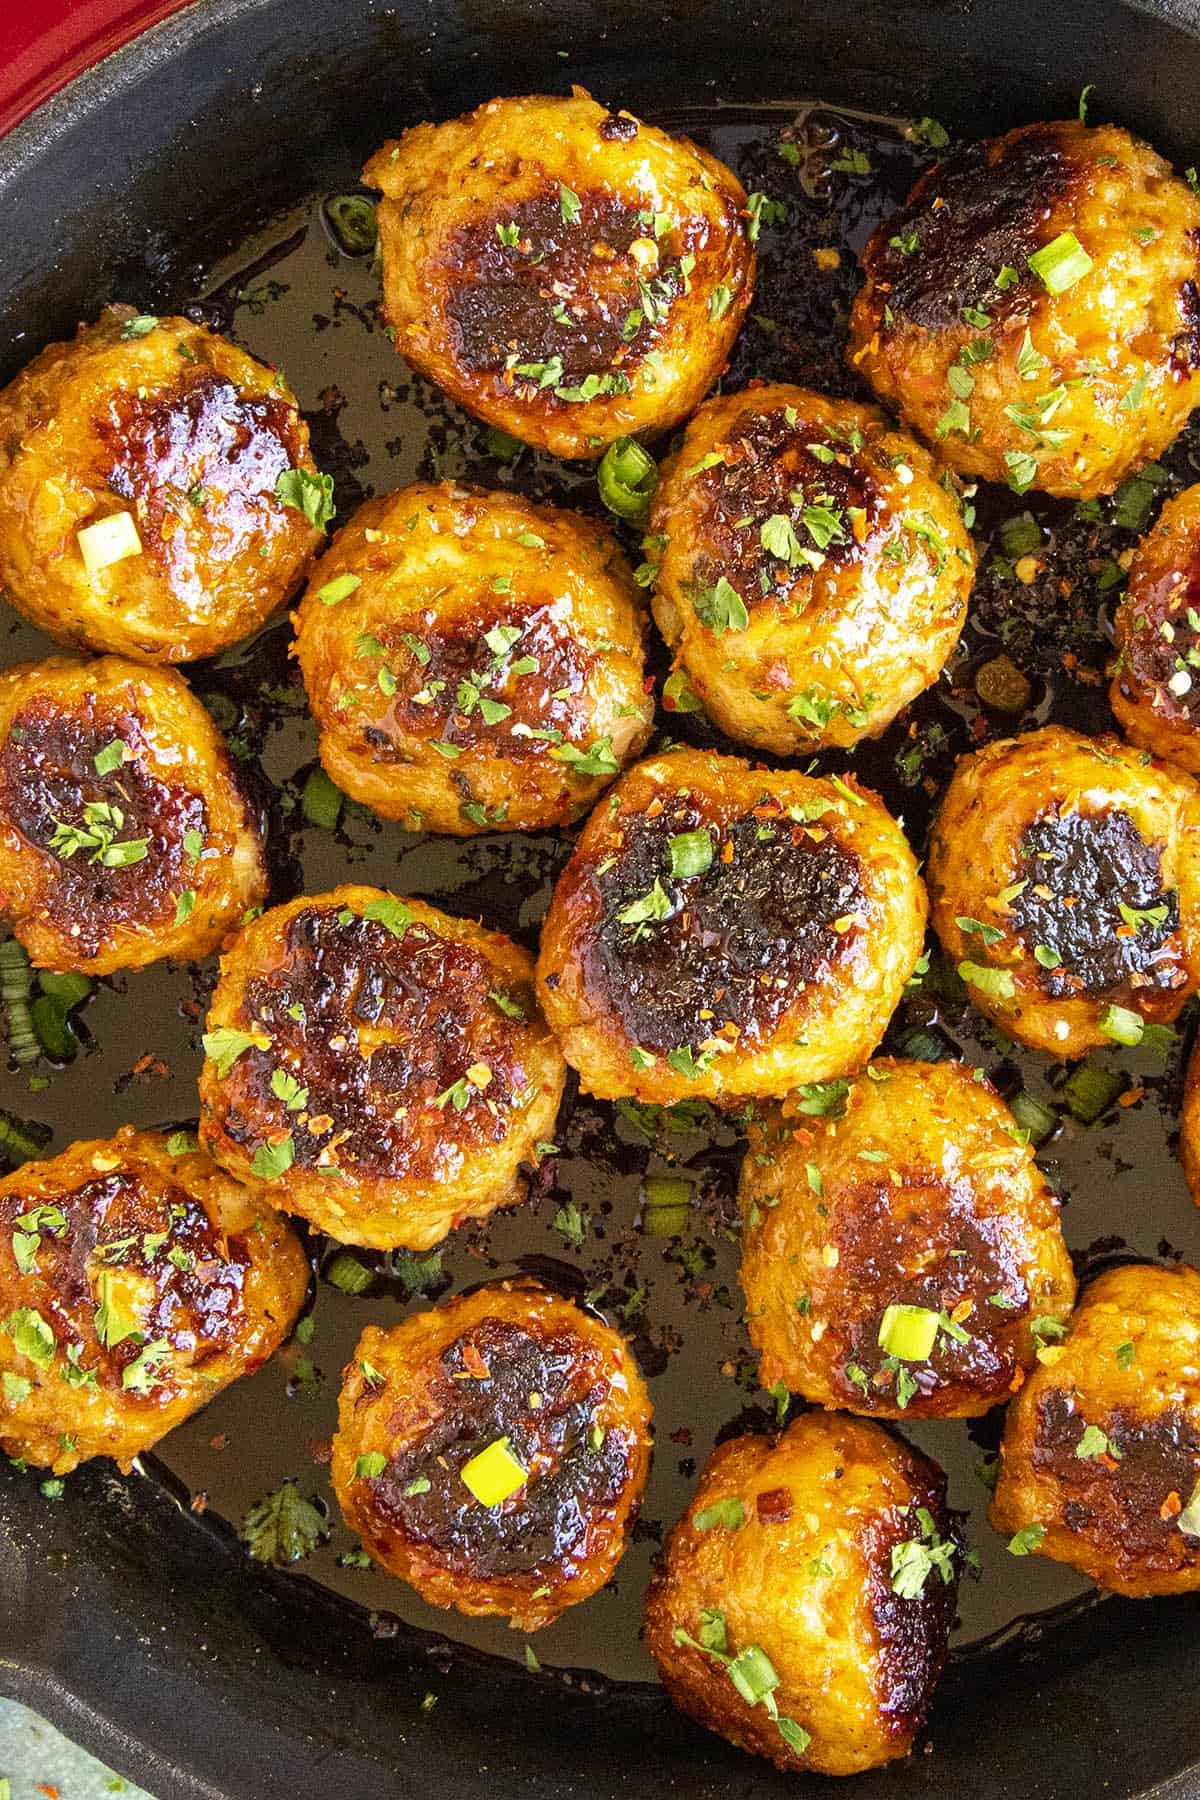 Delicious Korean Chicken Meatballs in a pan, ready to eat